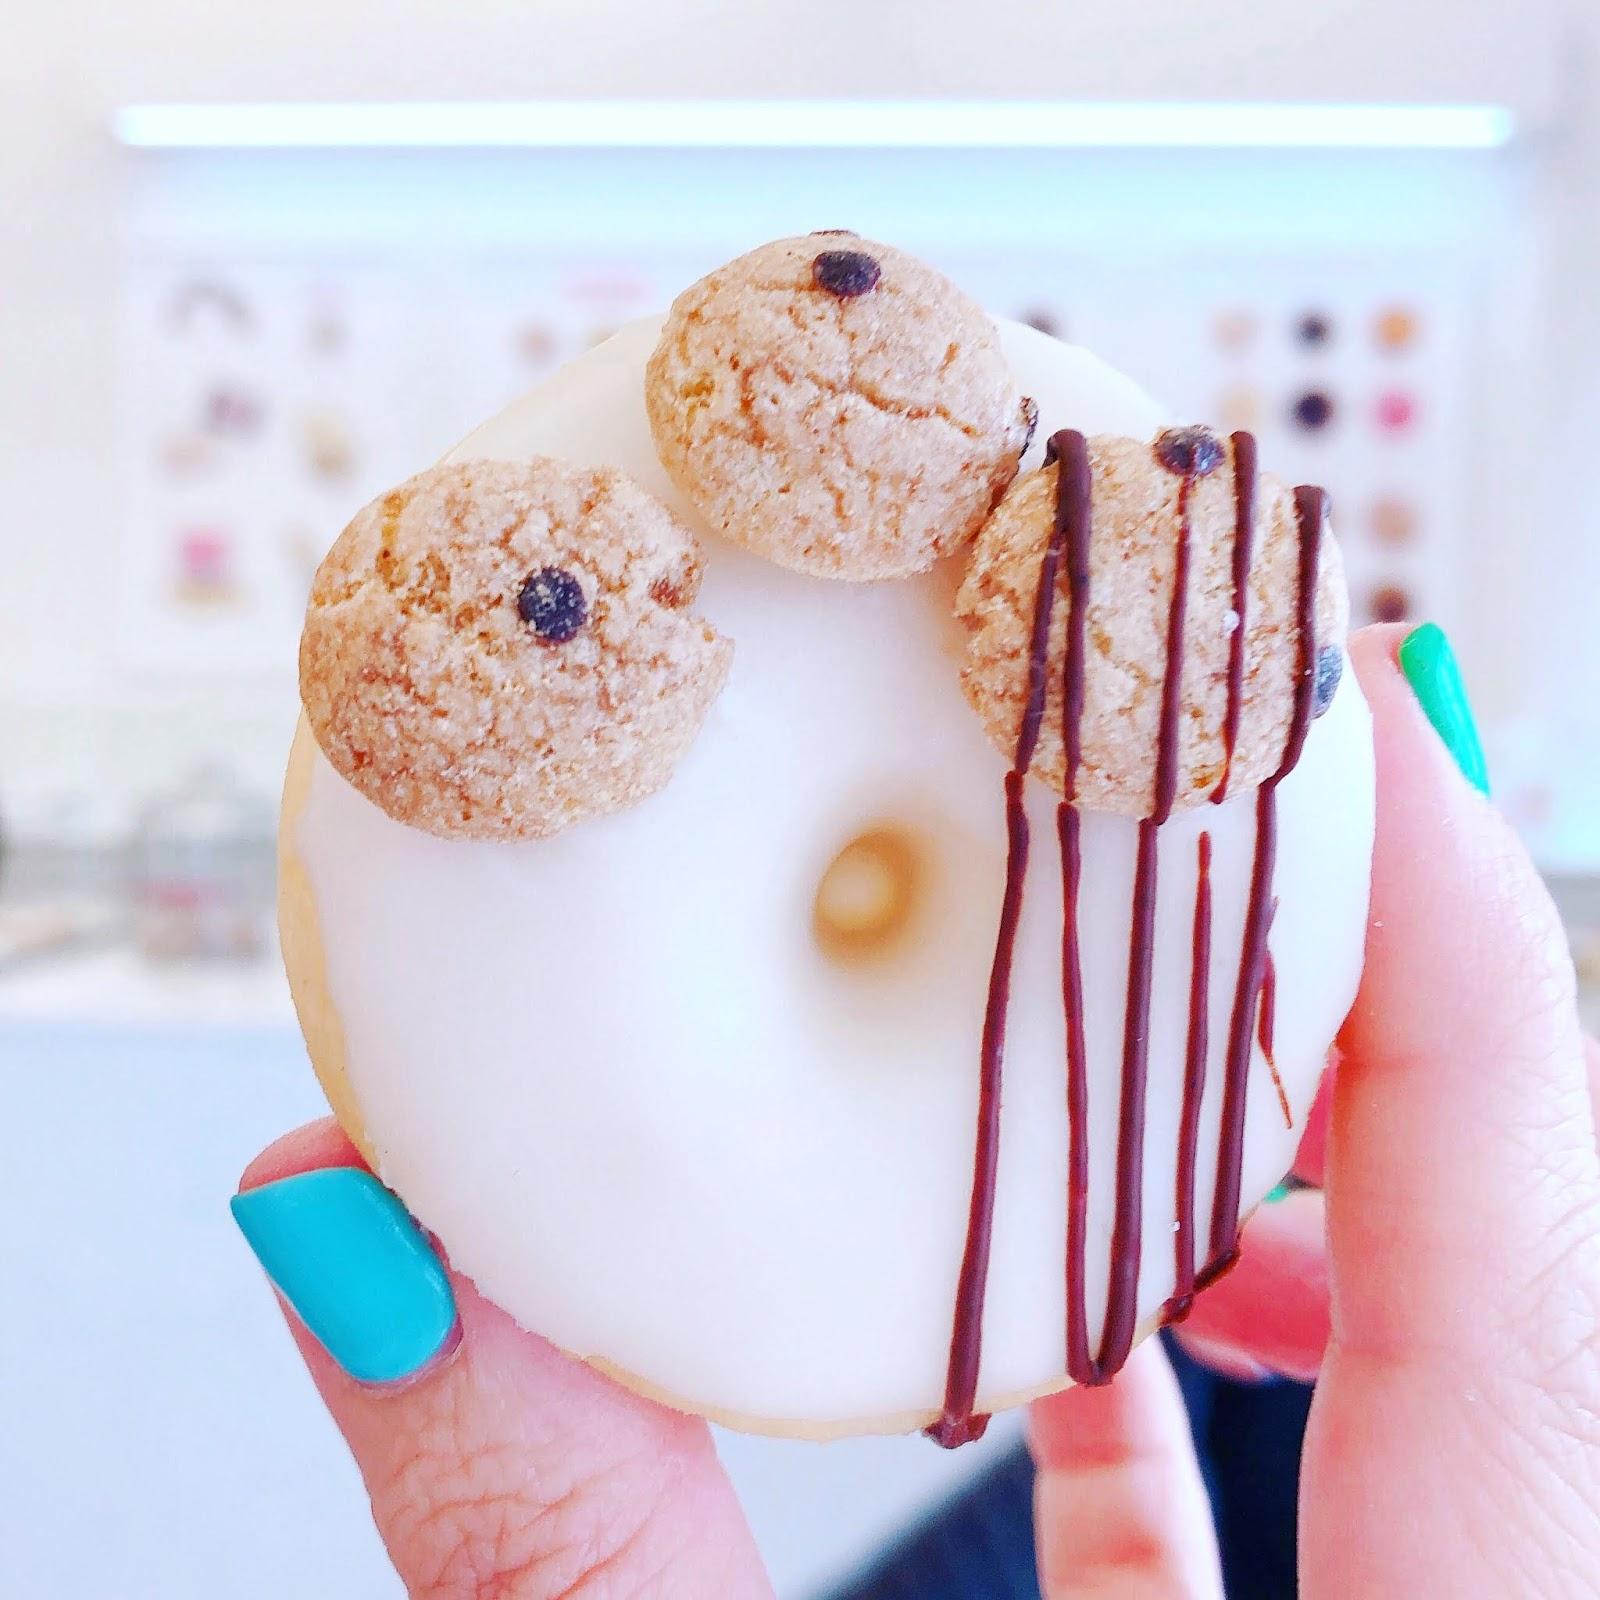 Te provoca una donut?